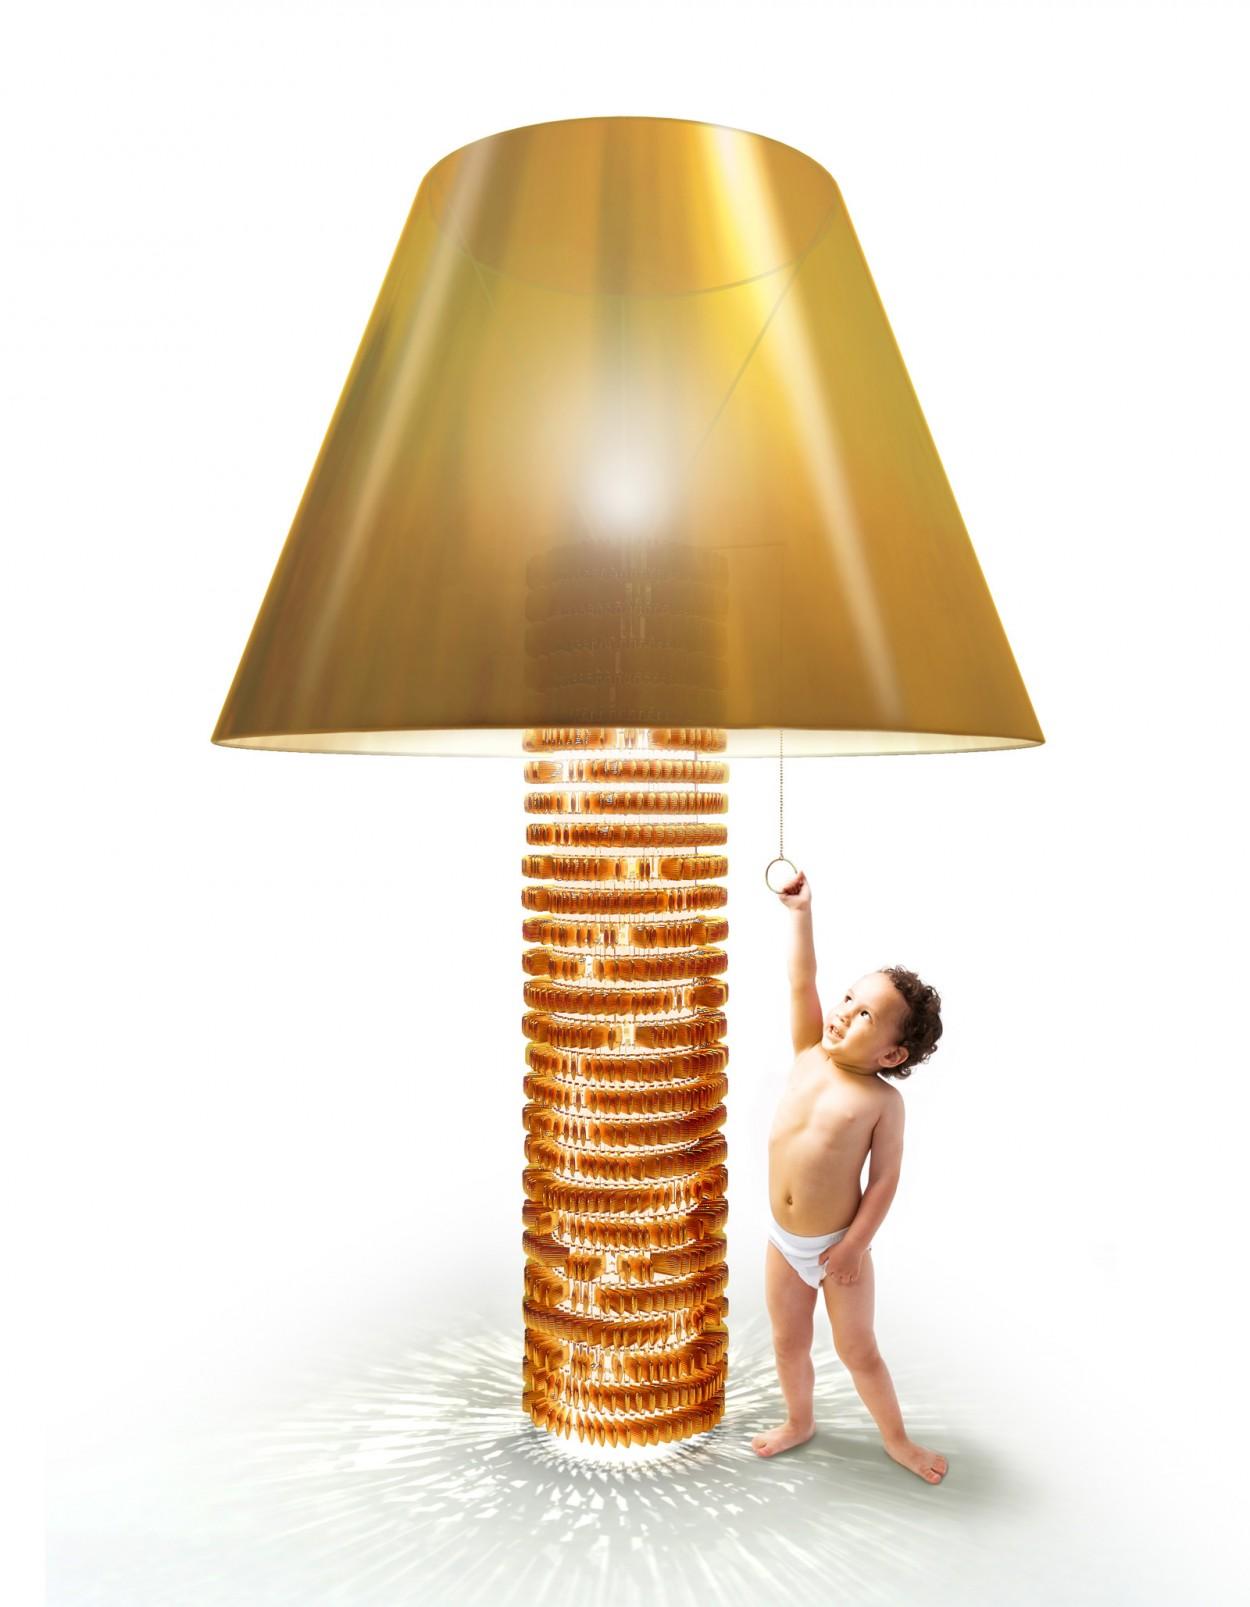 totem-floor-lamp-lampadaire-veronese-galante-lancman-2-1250x1607.jpg